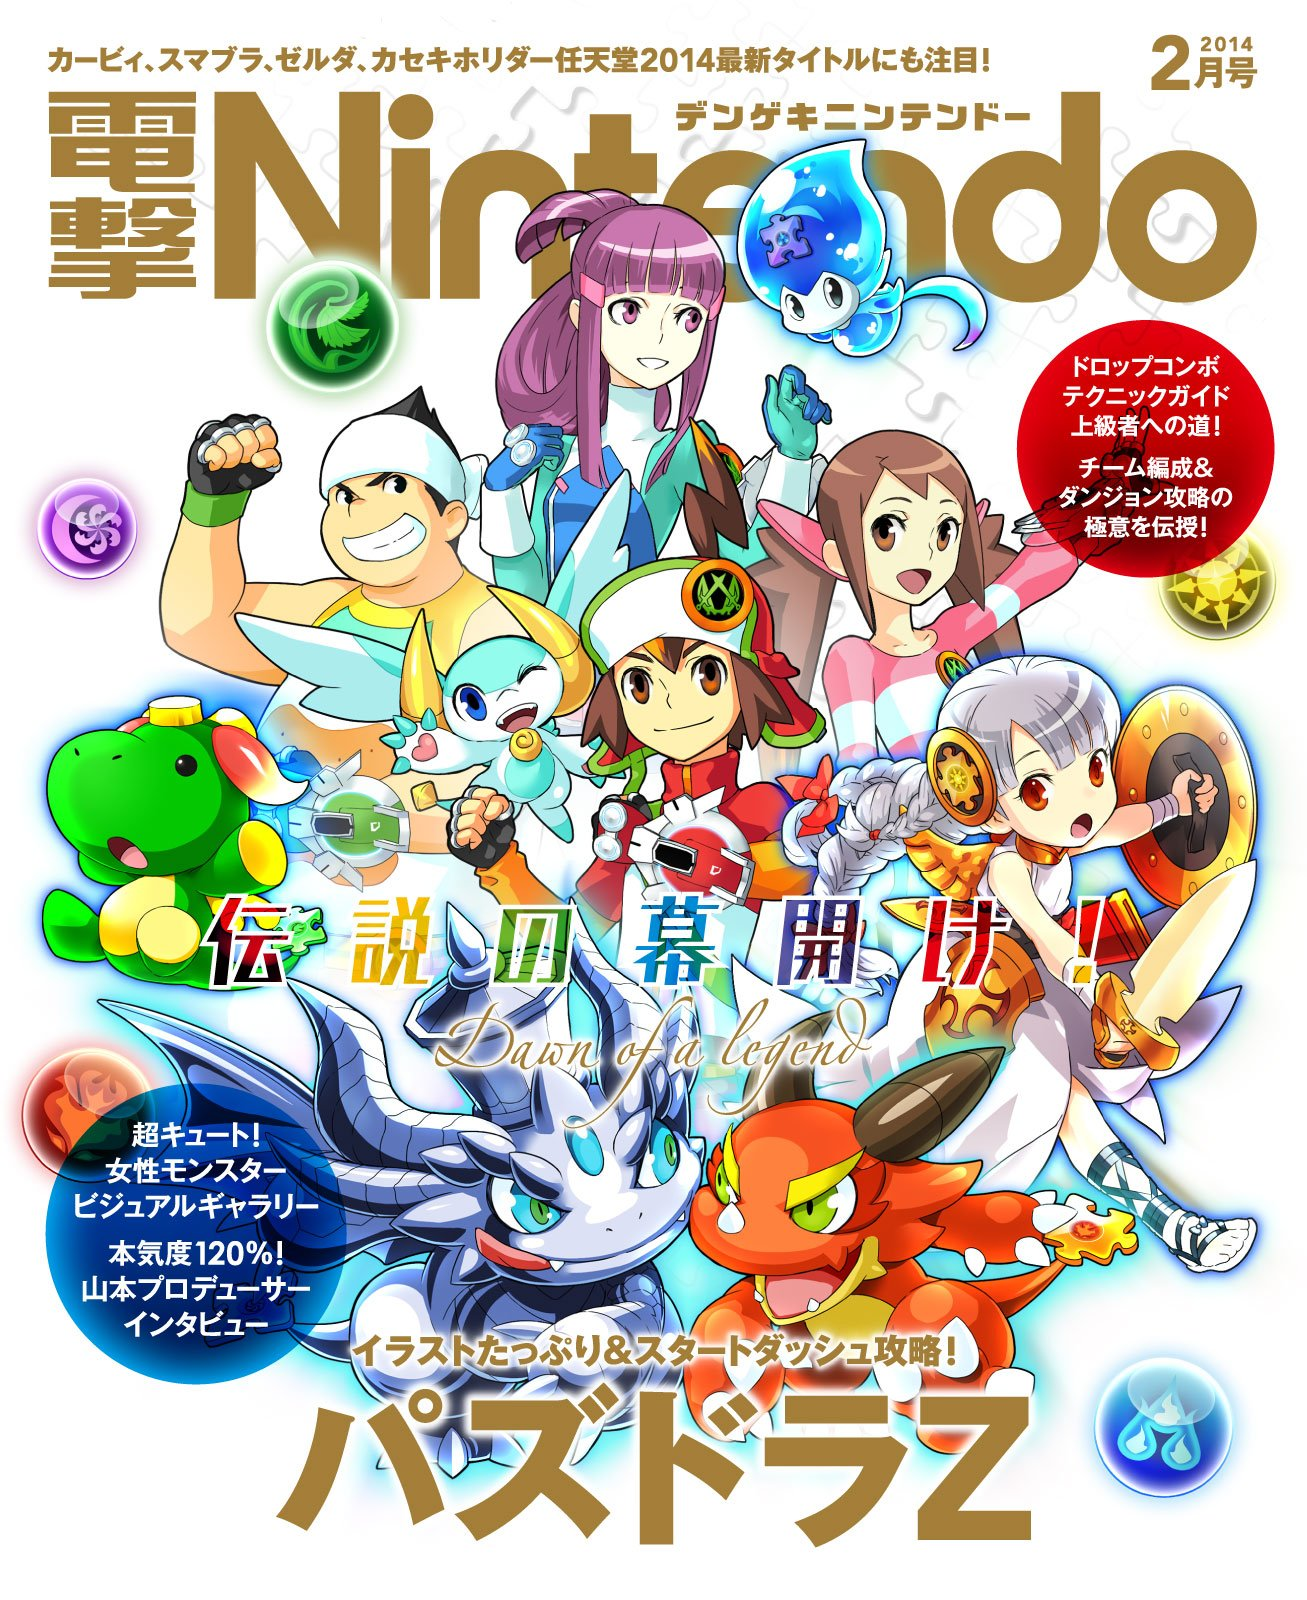 Dengeki Nintendo Issue 009 (February 2014)